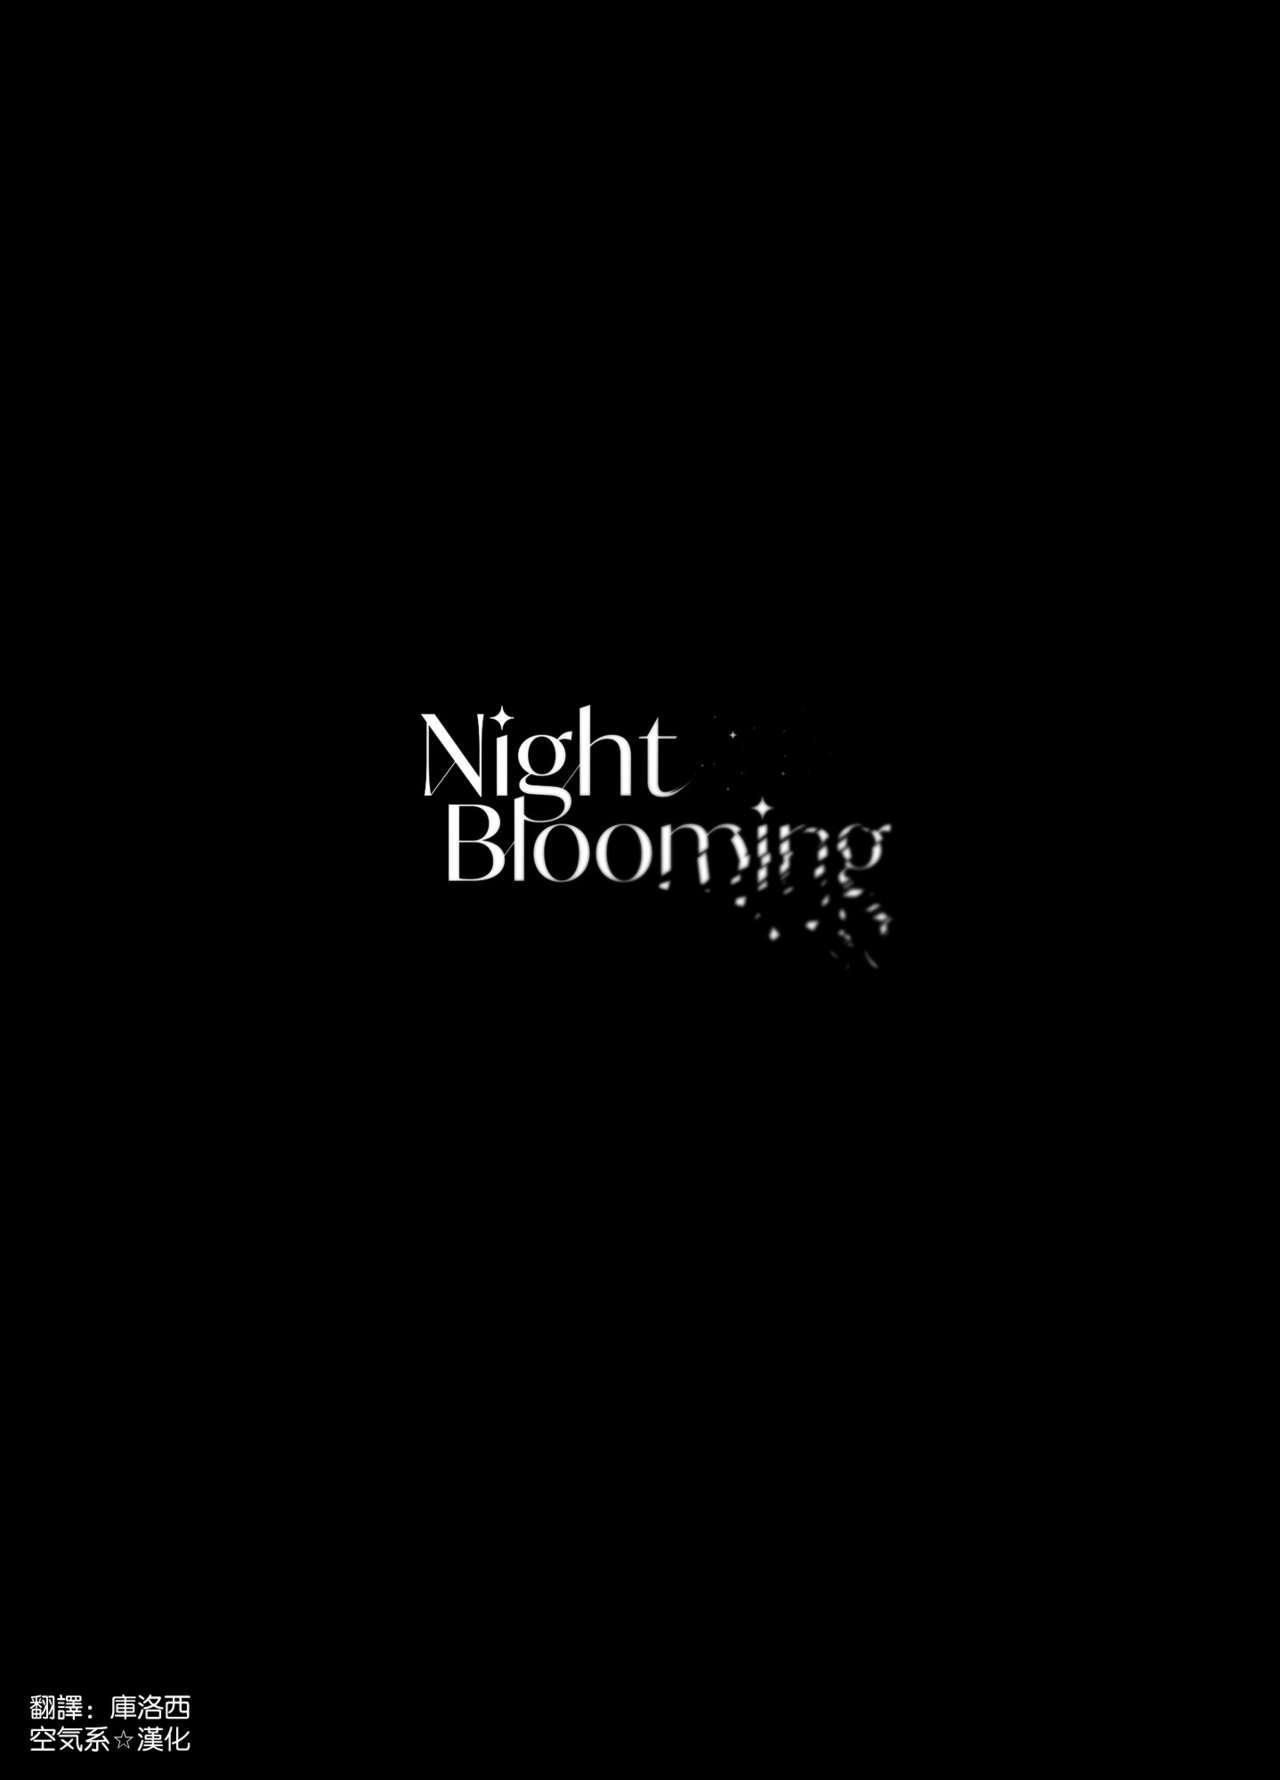 Night Blooming 42